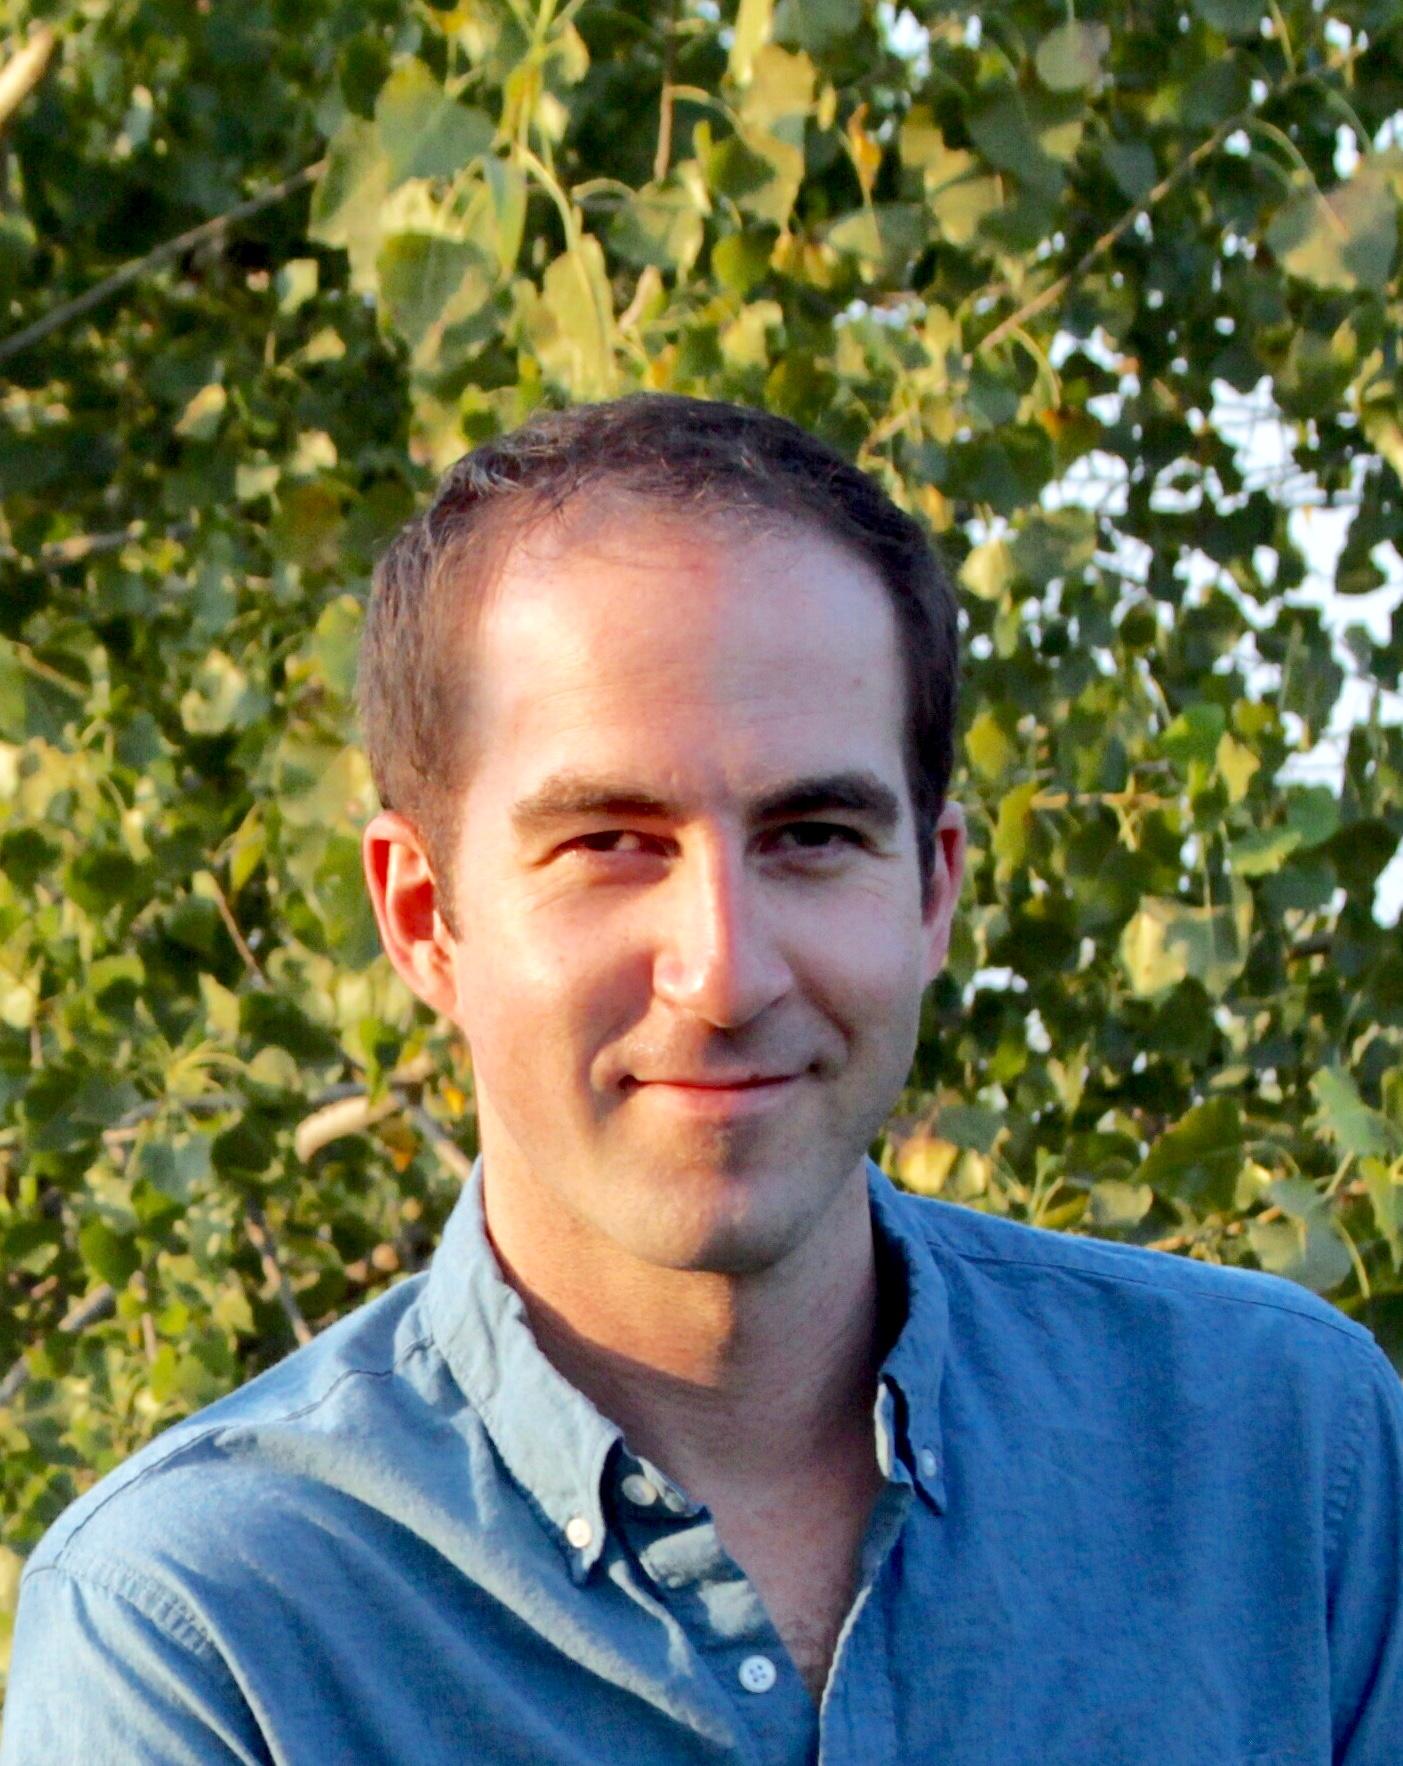 Brandon-Hubbard-00.jpg